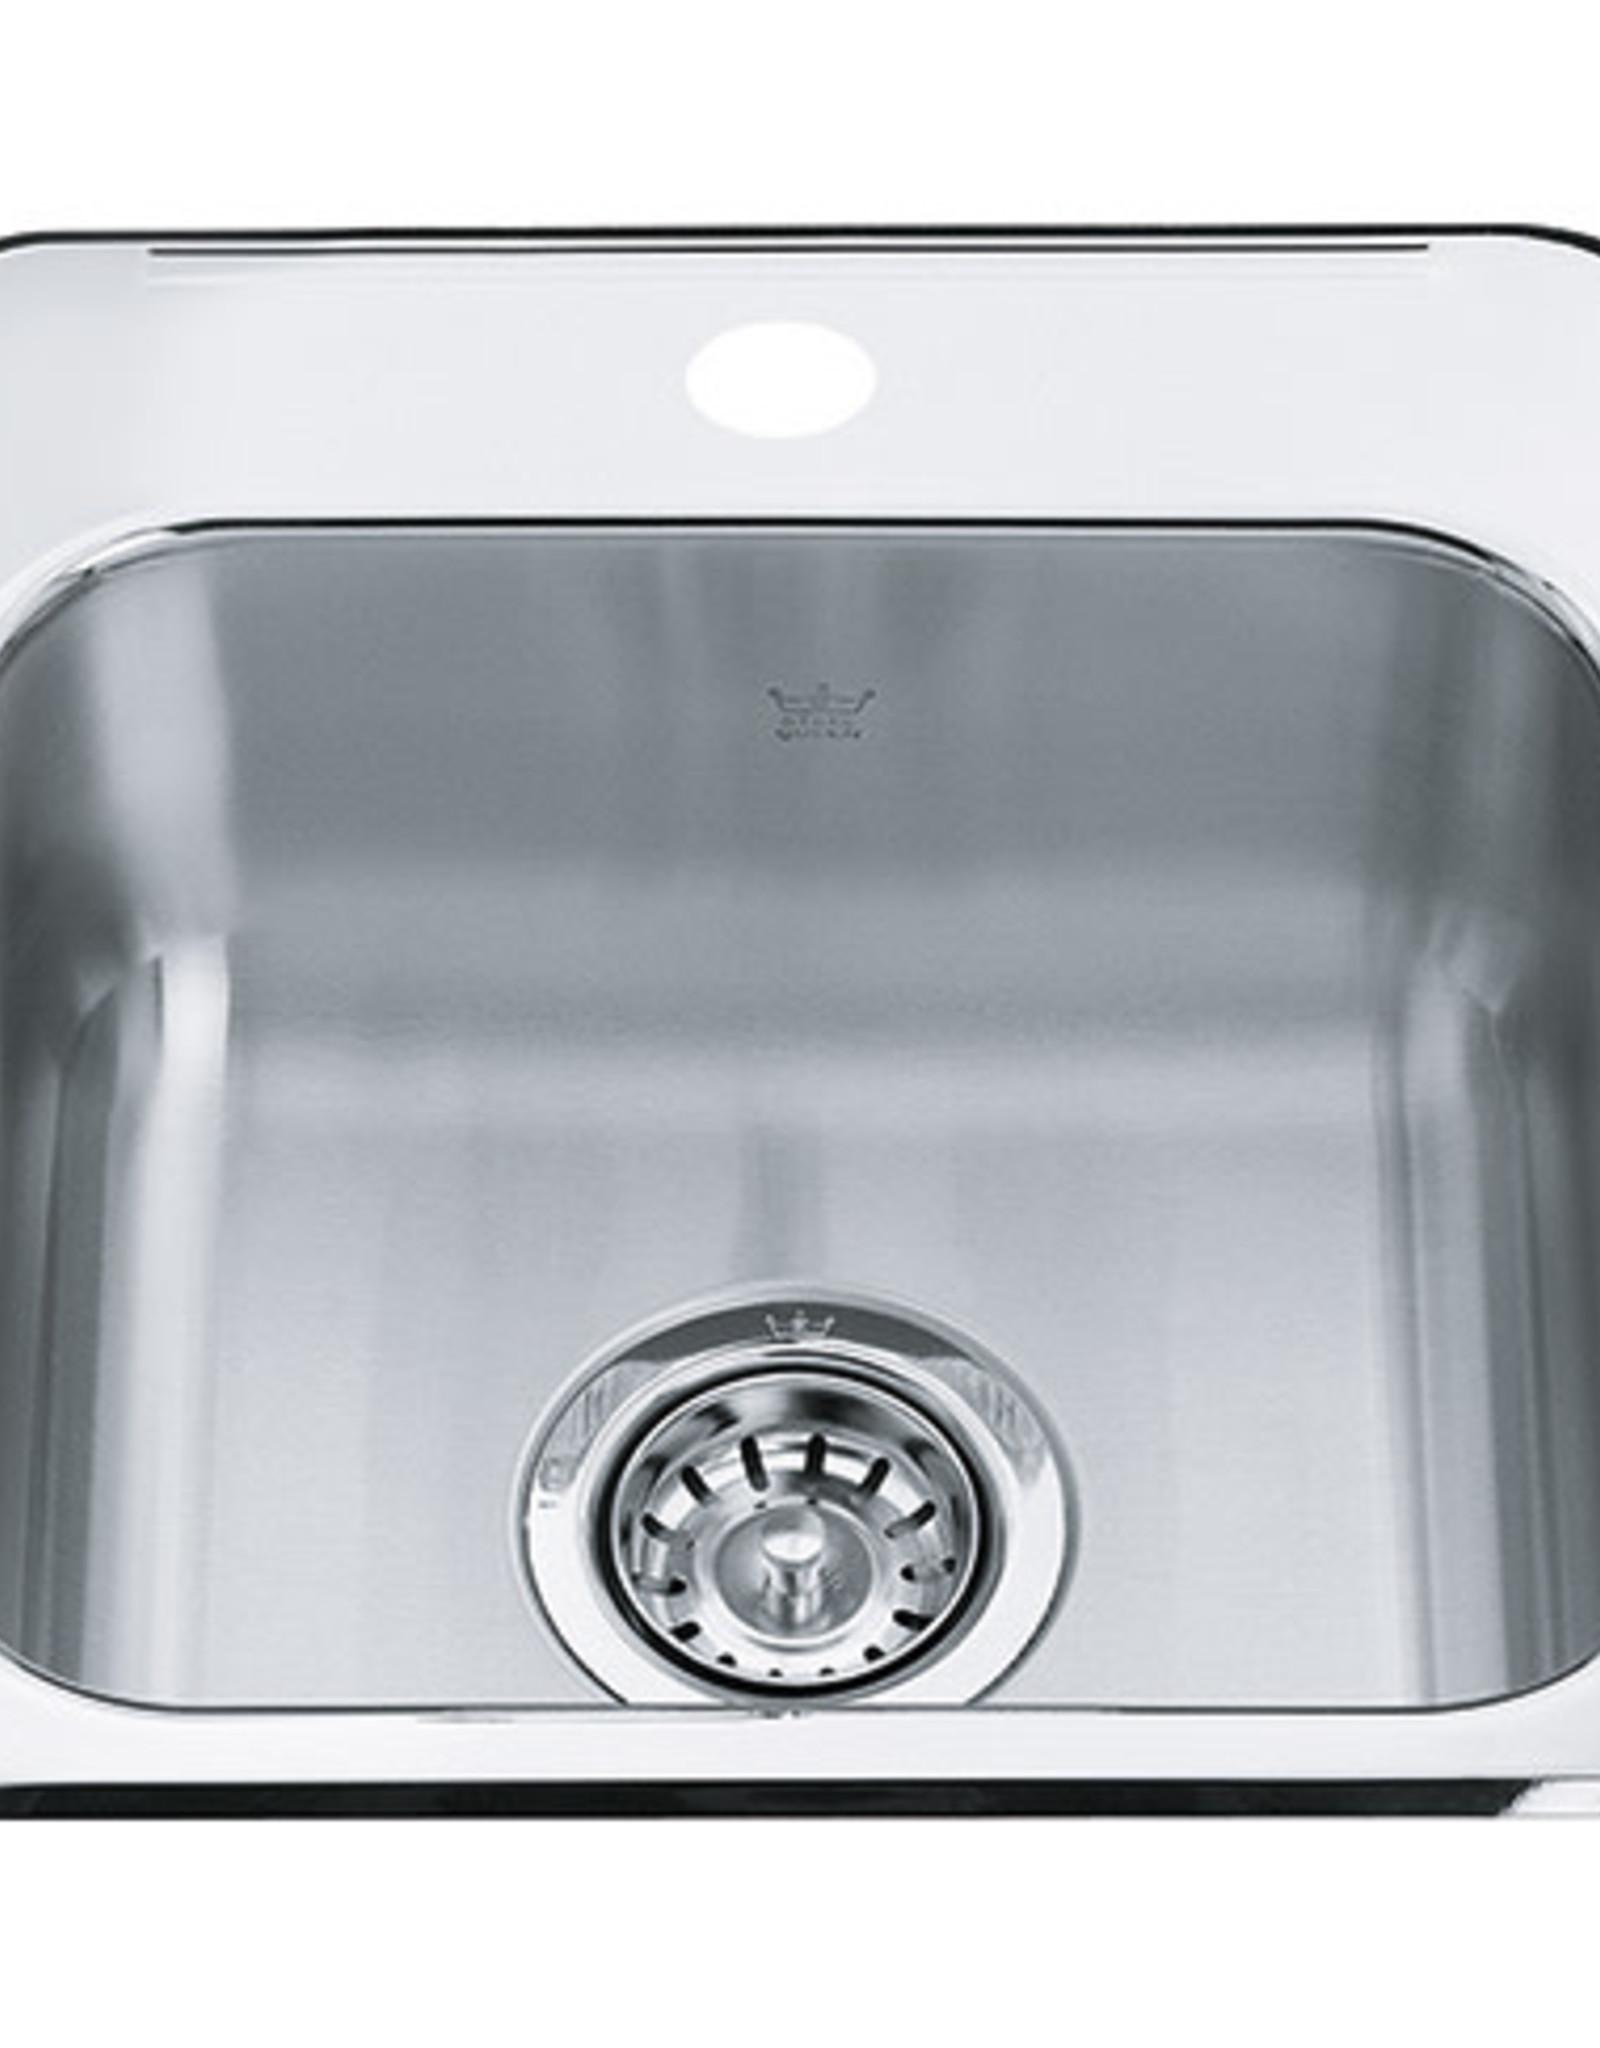 Kindred Reginox RSL1515-6 Single Hole Bar Sink